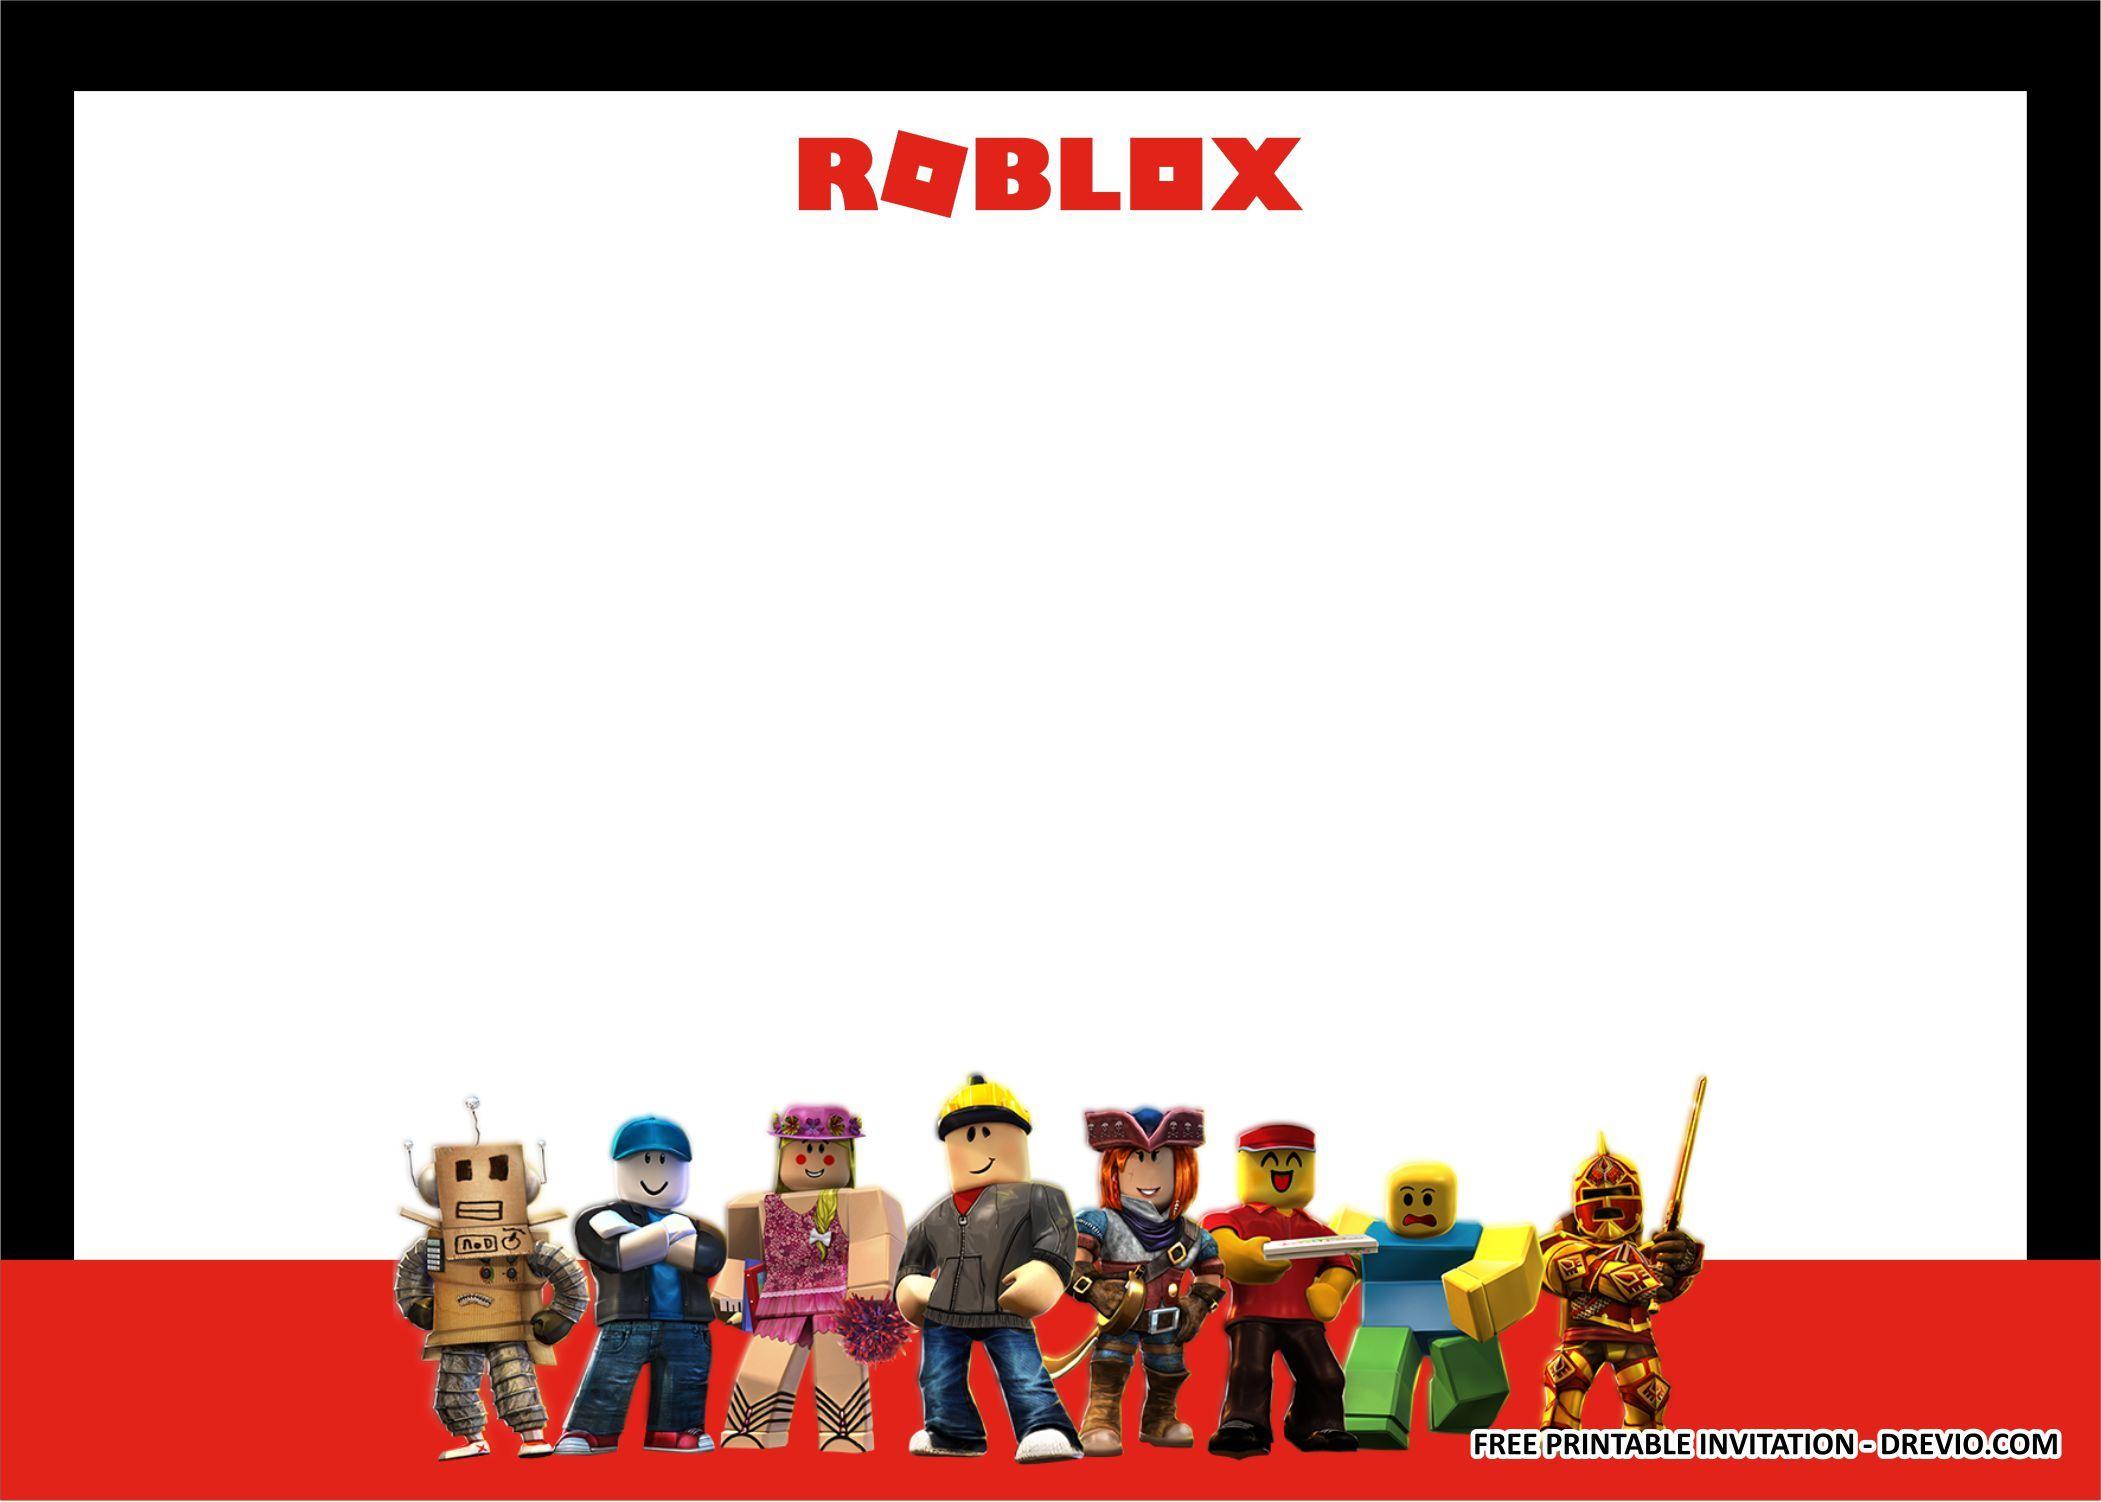 FREE PRINTABLE) ROBLOX Birthday Party Kits Templates Birthday